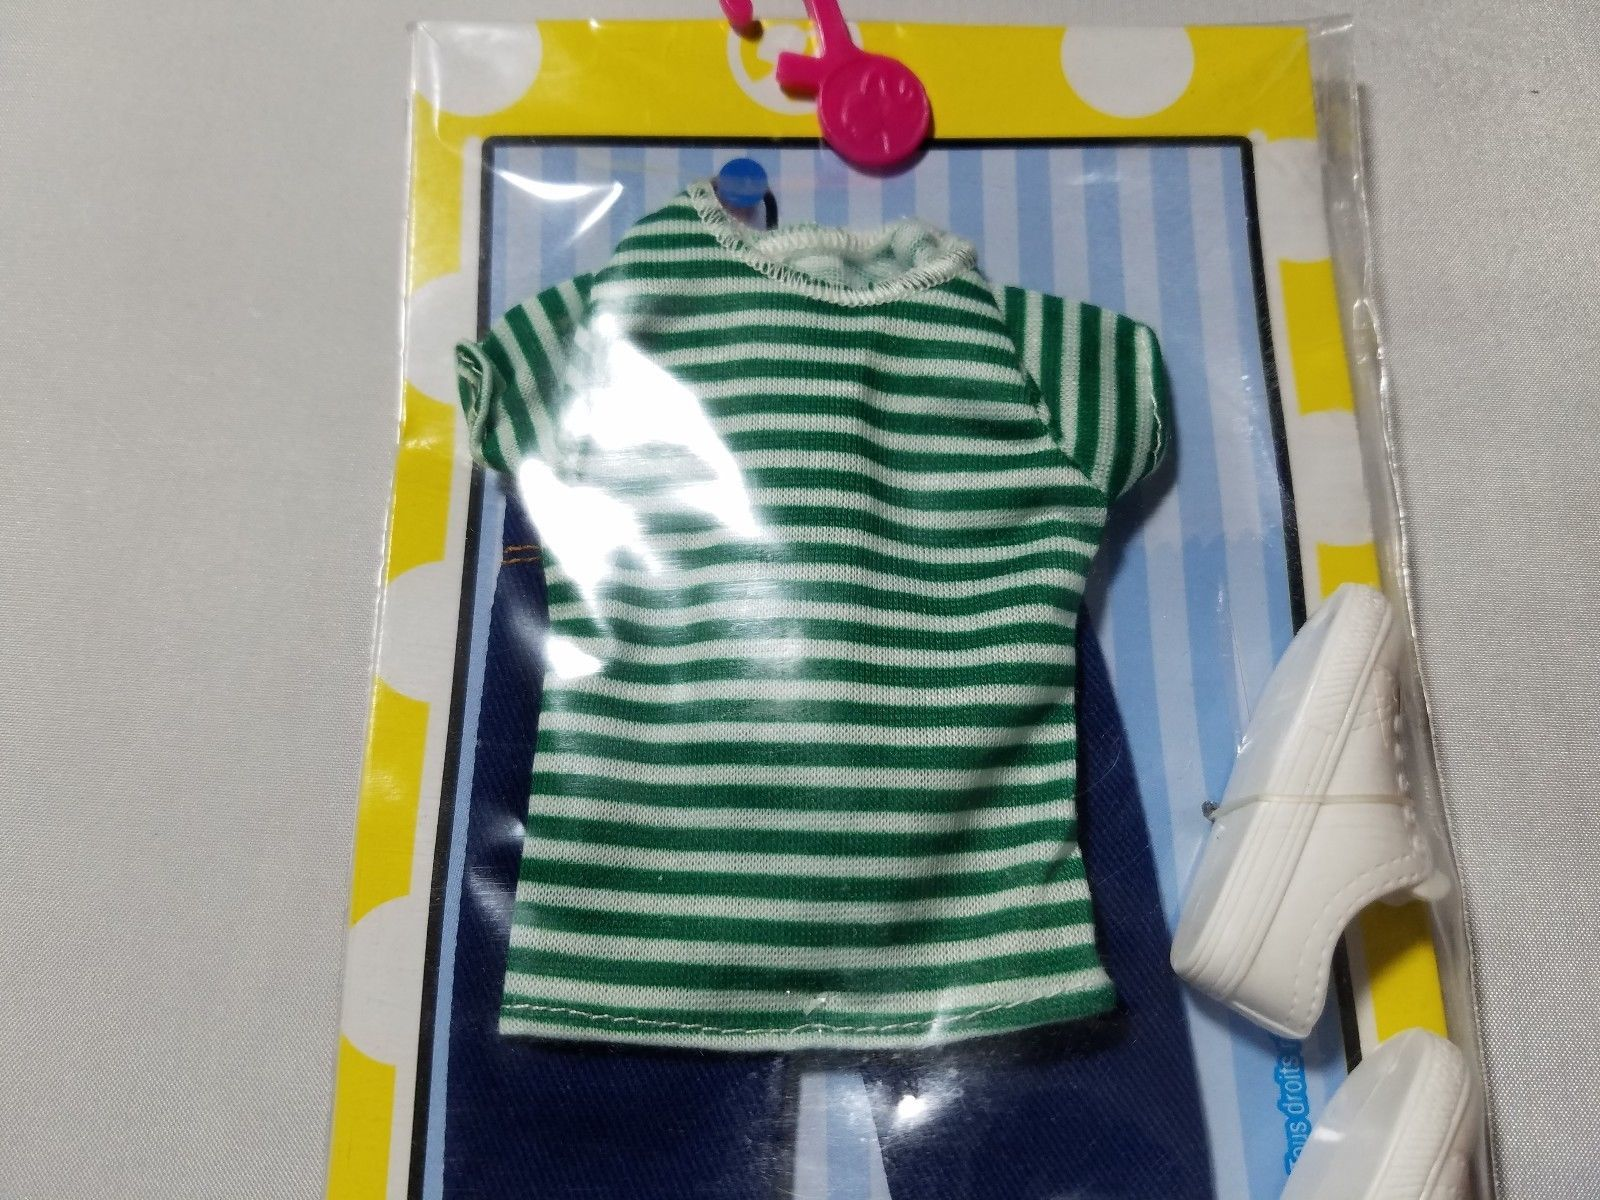 Ken Fashions Outfit Mattel Barbie NIB Casual Striped T-Shirt Jeans Shoes